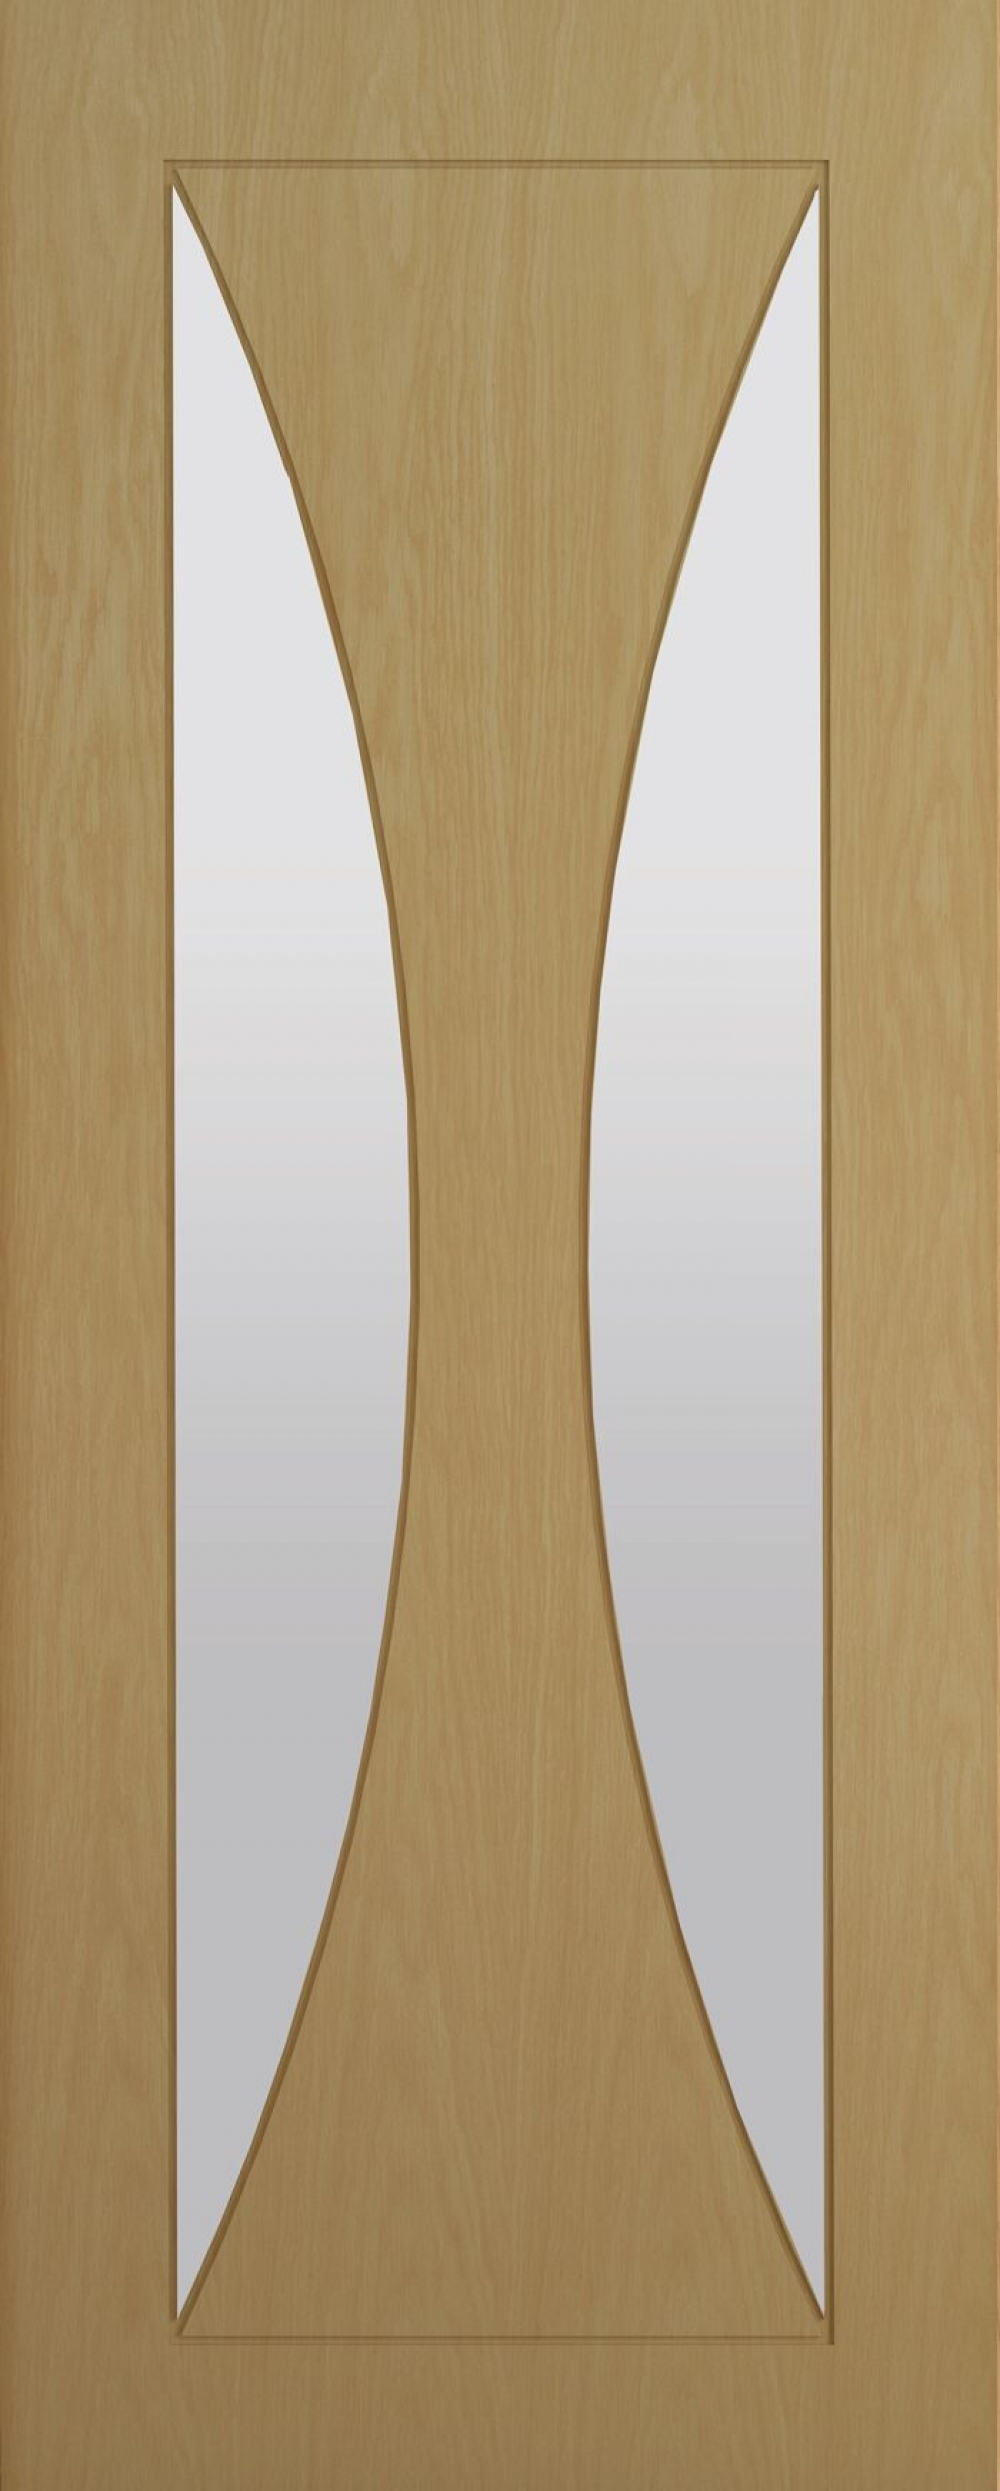 Sorrento Glazed Oak Prefinished